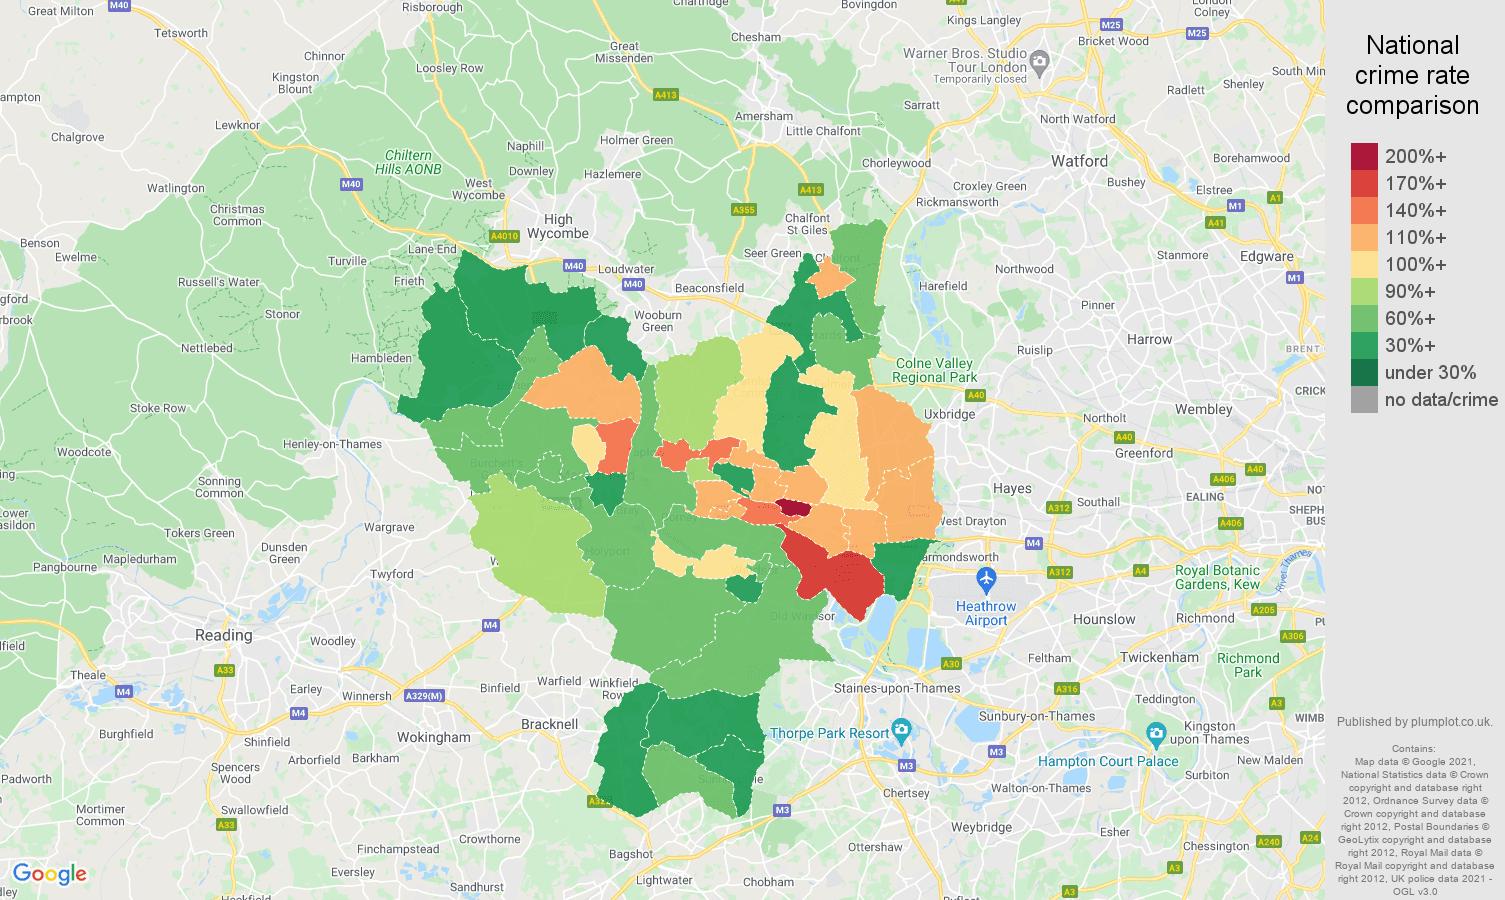 Slough criminal damage and arson crime rate comparison map